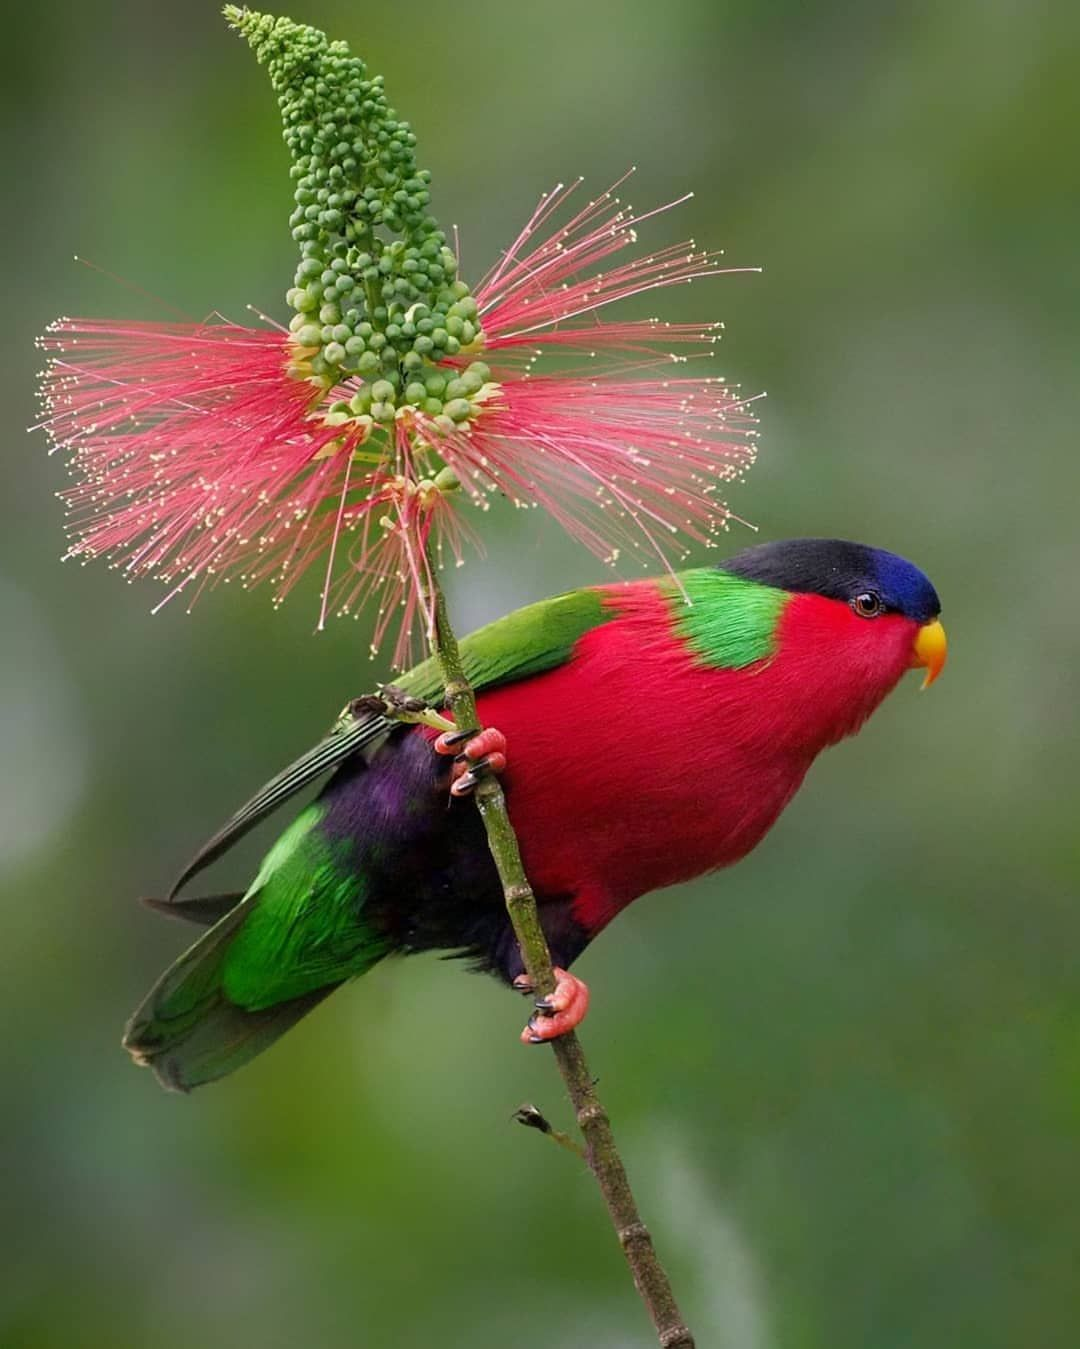 Birds Wildlife Photography On Instagram Collared Lory Phigys Solitarius Photo Location Fiji Rainforest Birds Bird Pictures Beautiful Birds